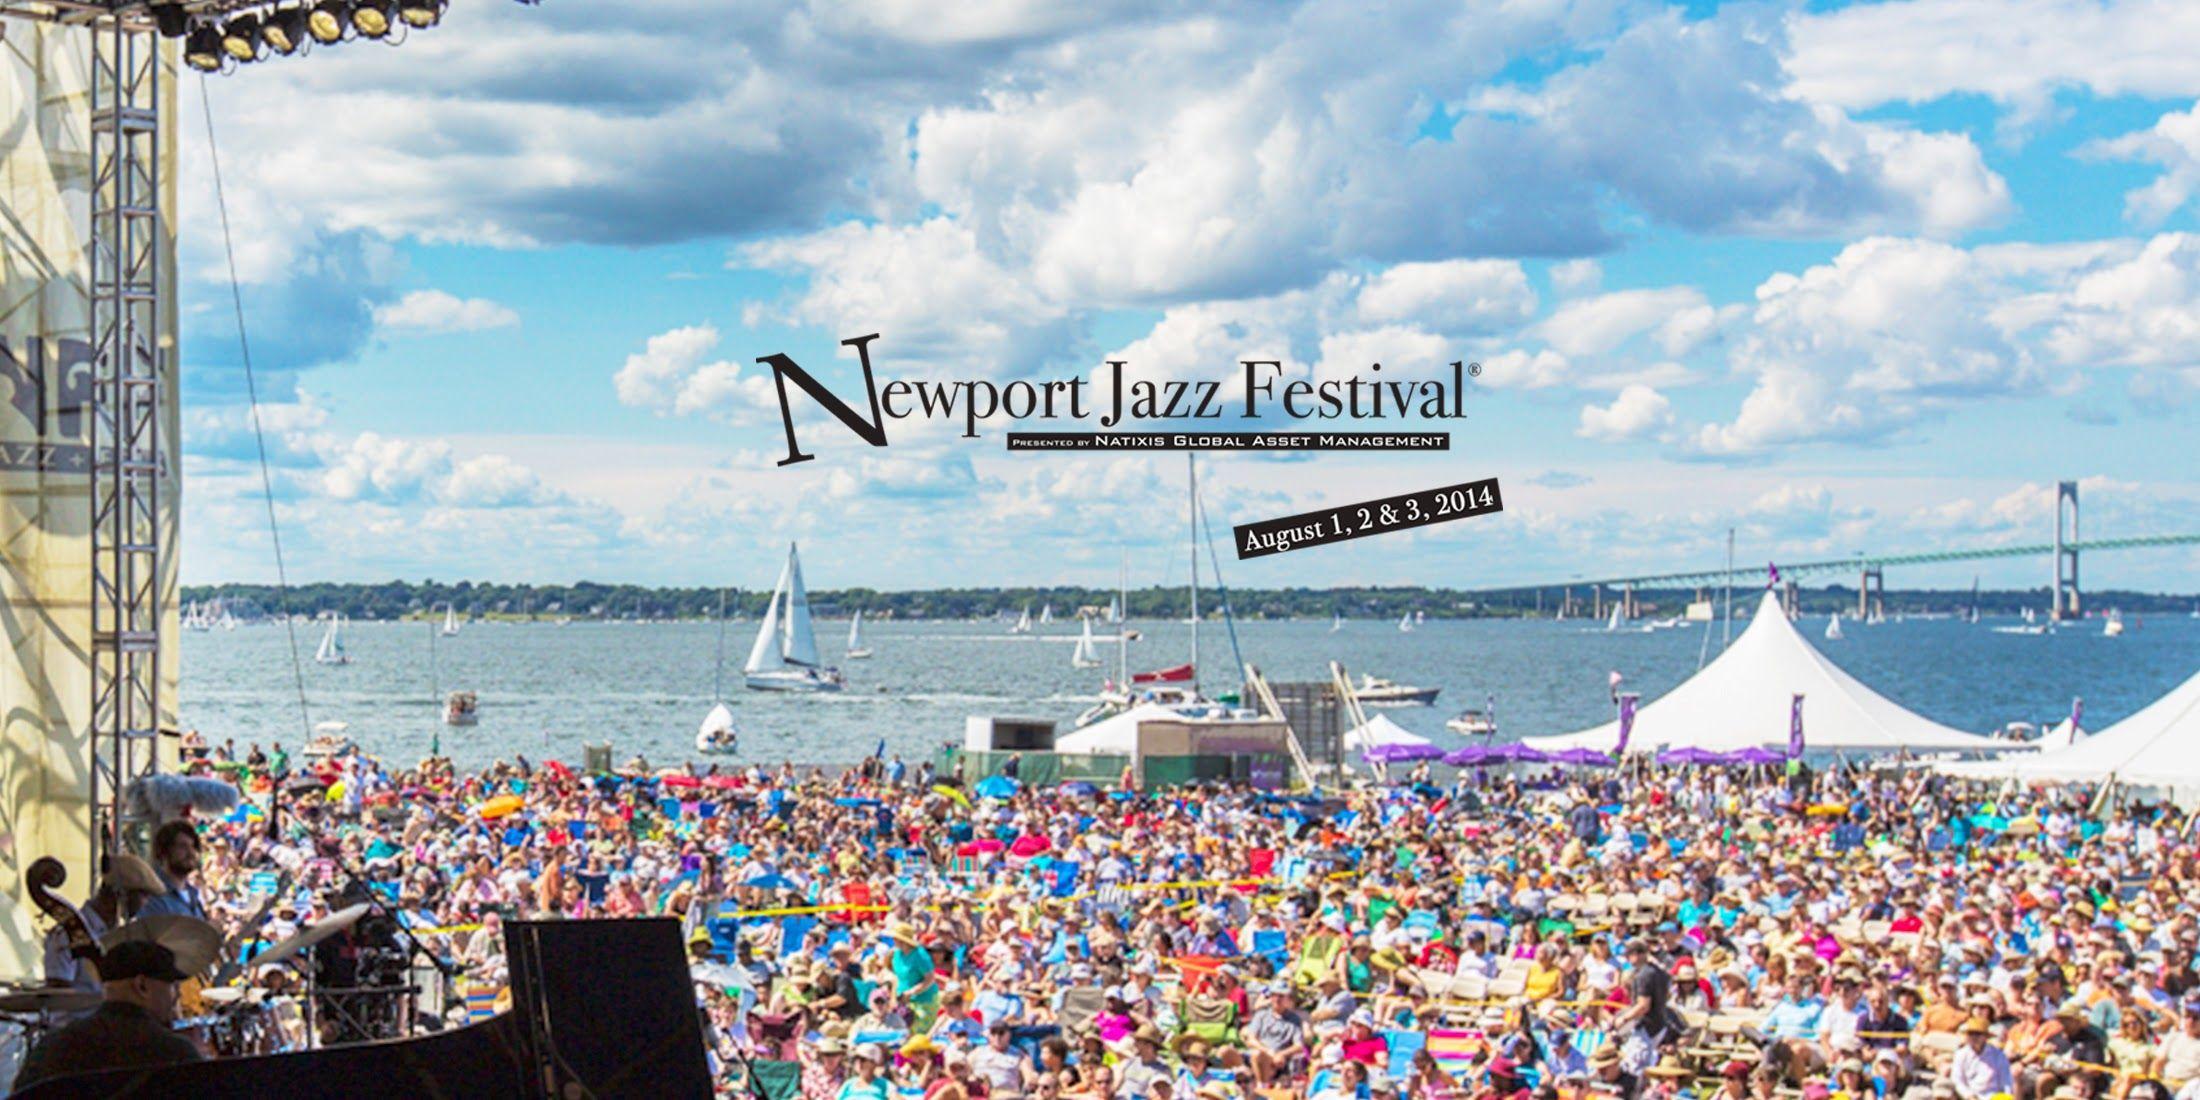 Newport Jazz Festival 2014